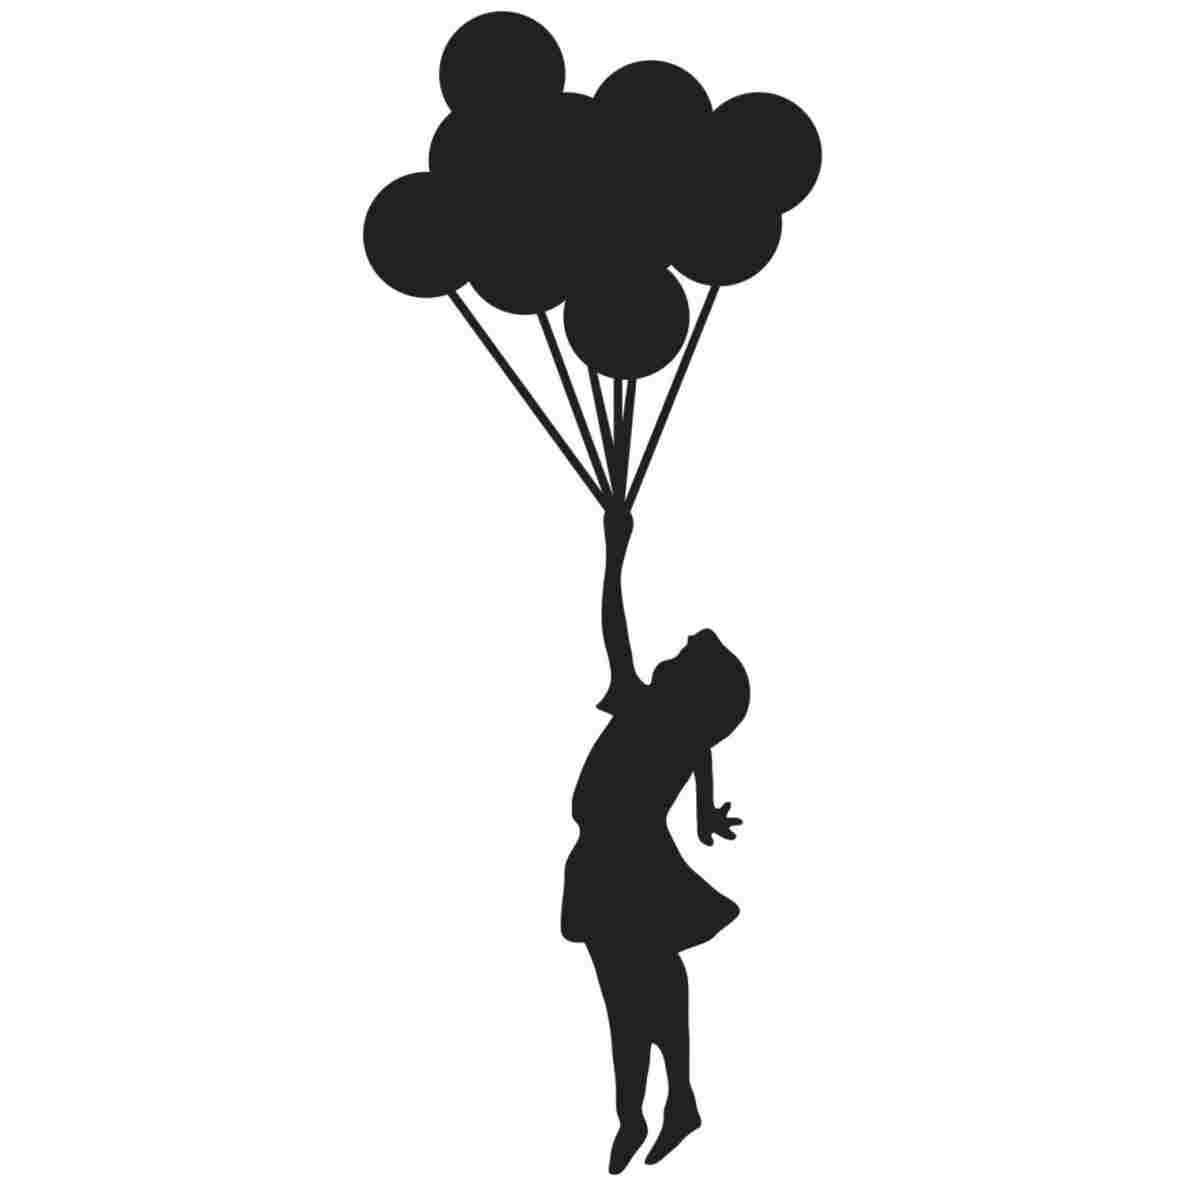 1185x1185 Art Rhcom D S Balloons Car D Animal Holding An Umbrella